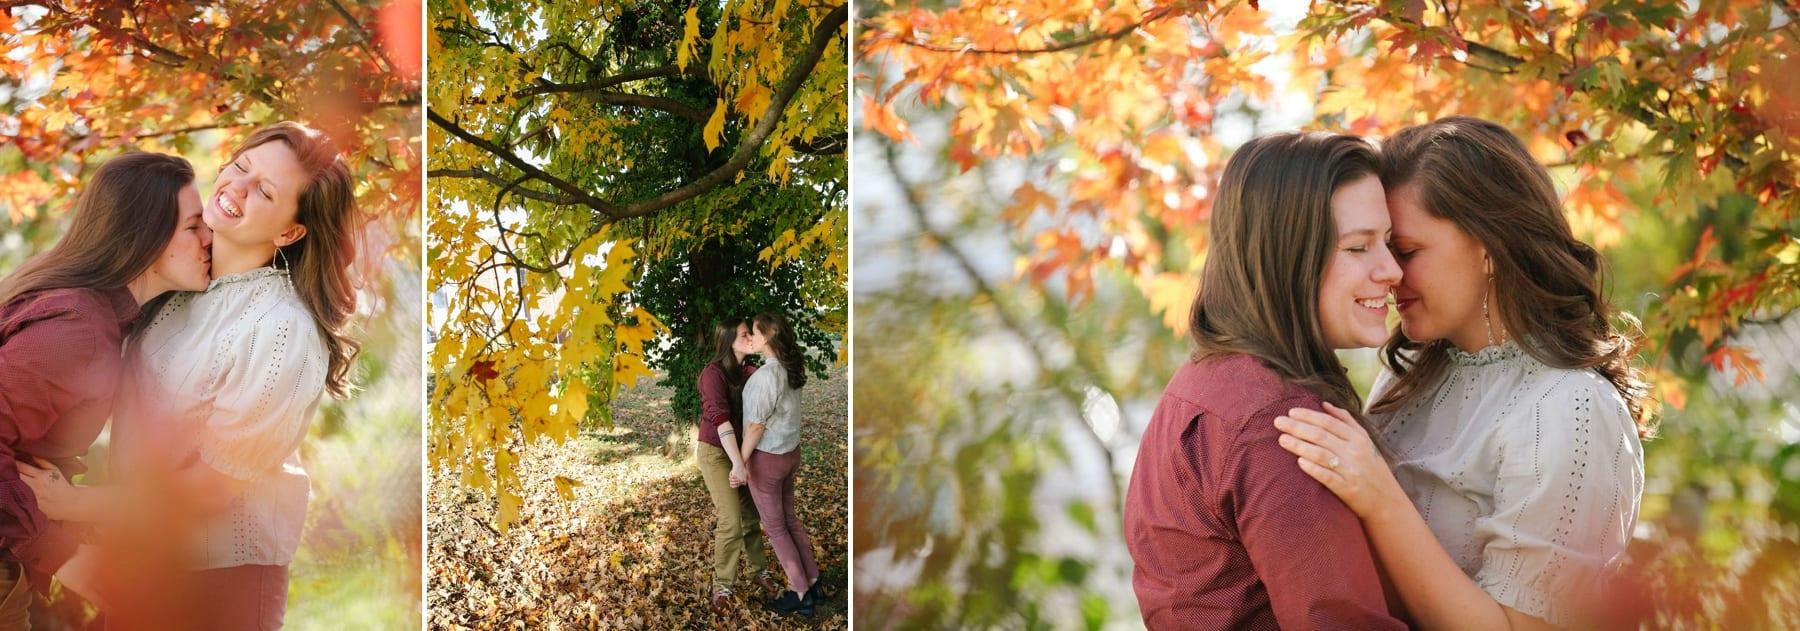 Two women in love in Knoxville, TN